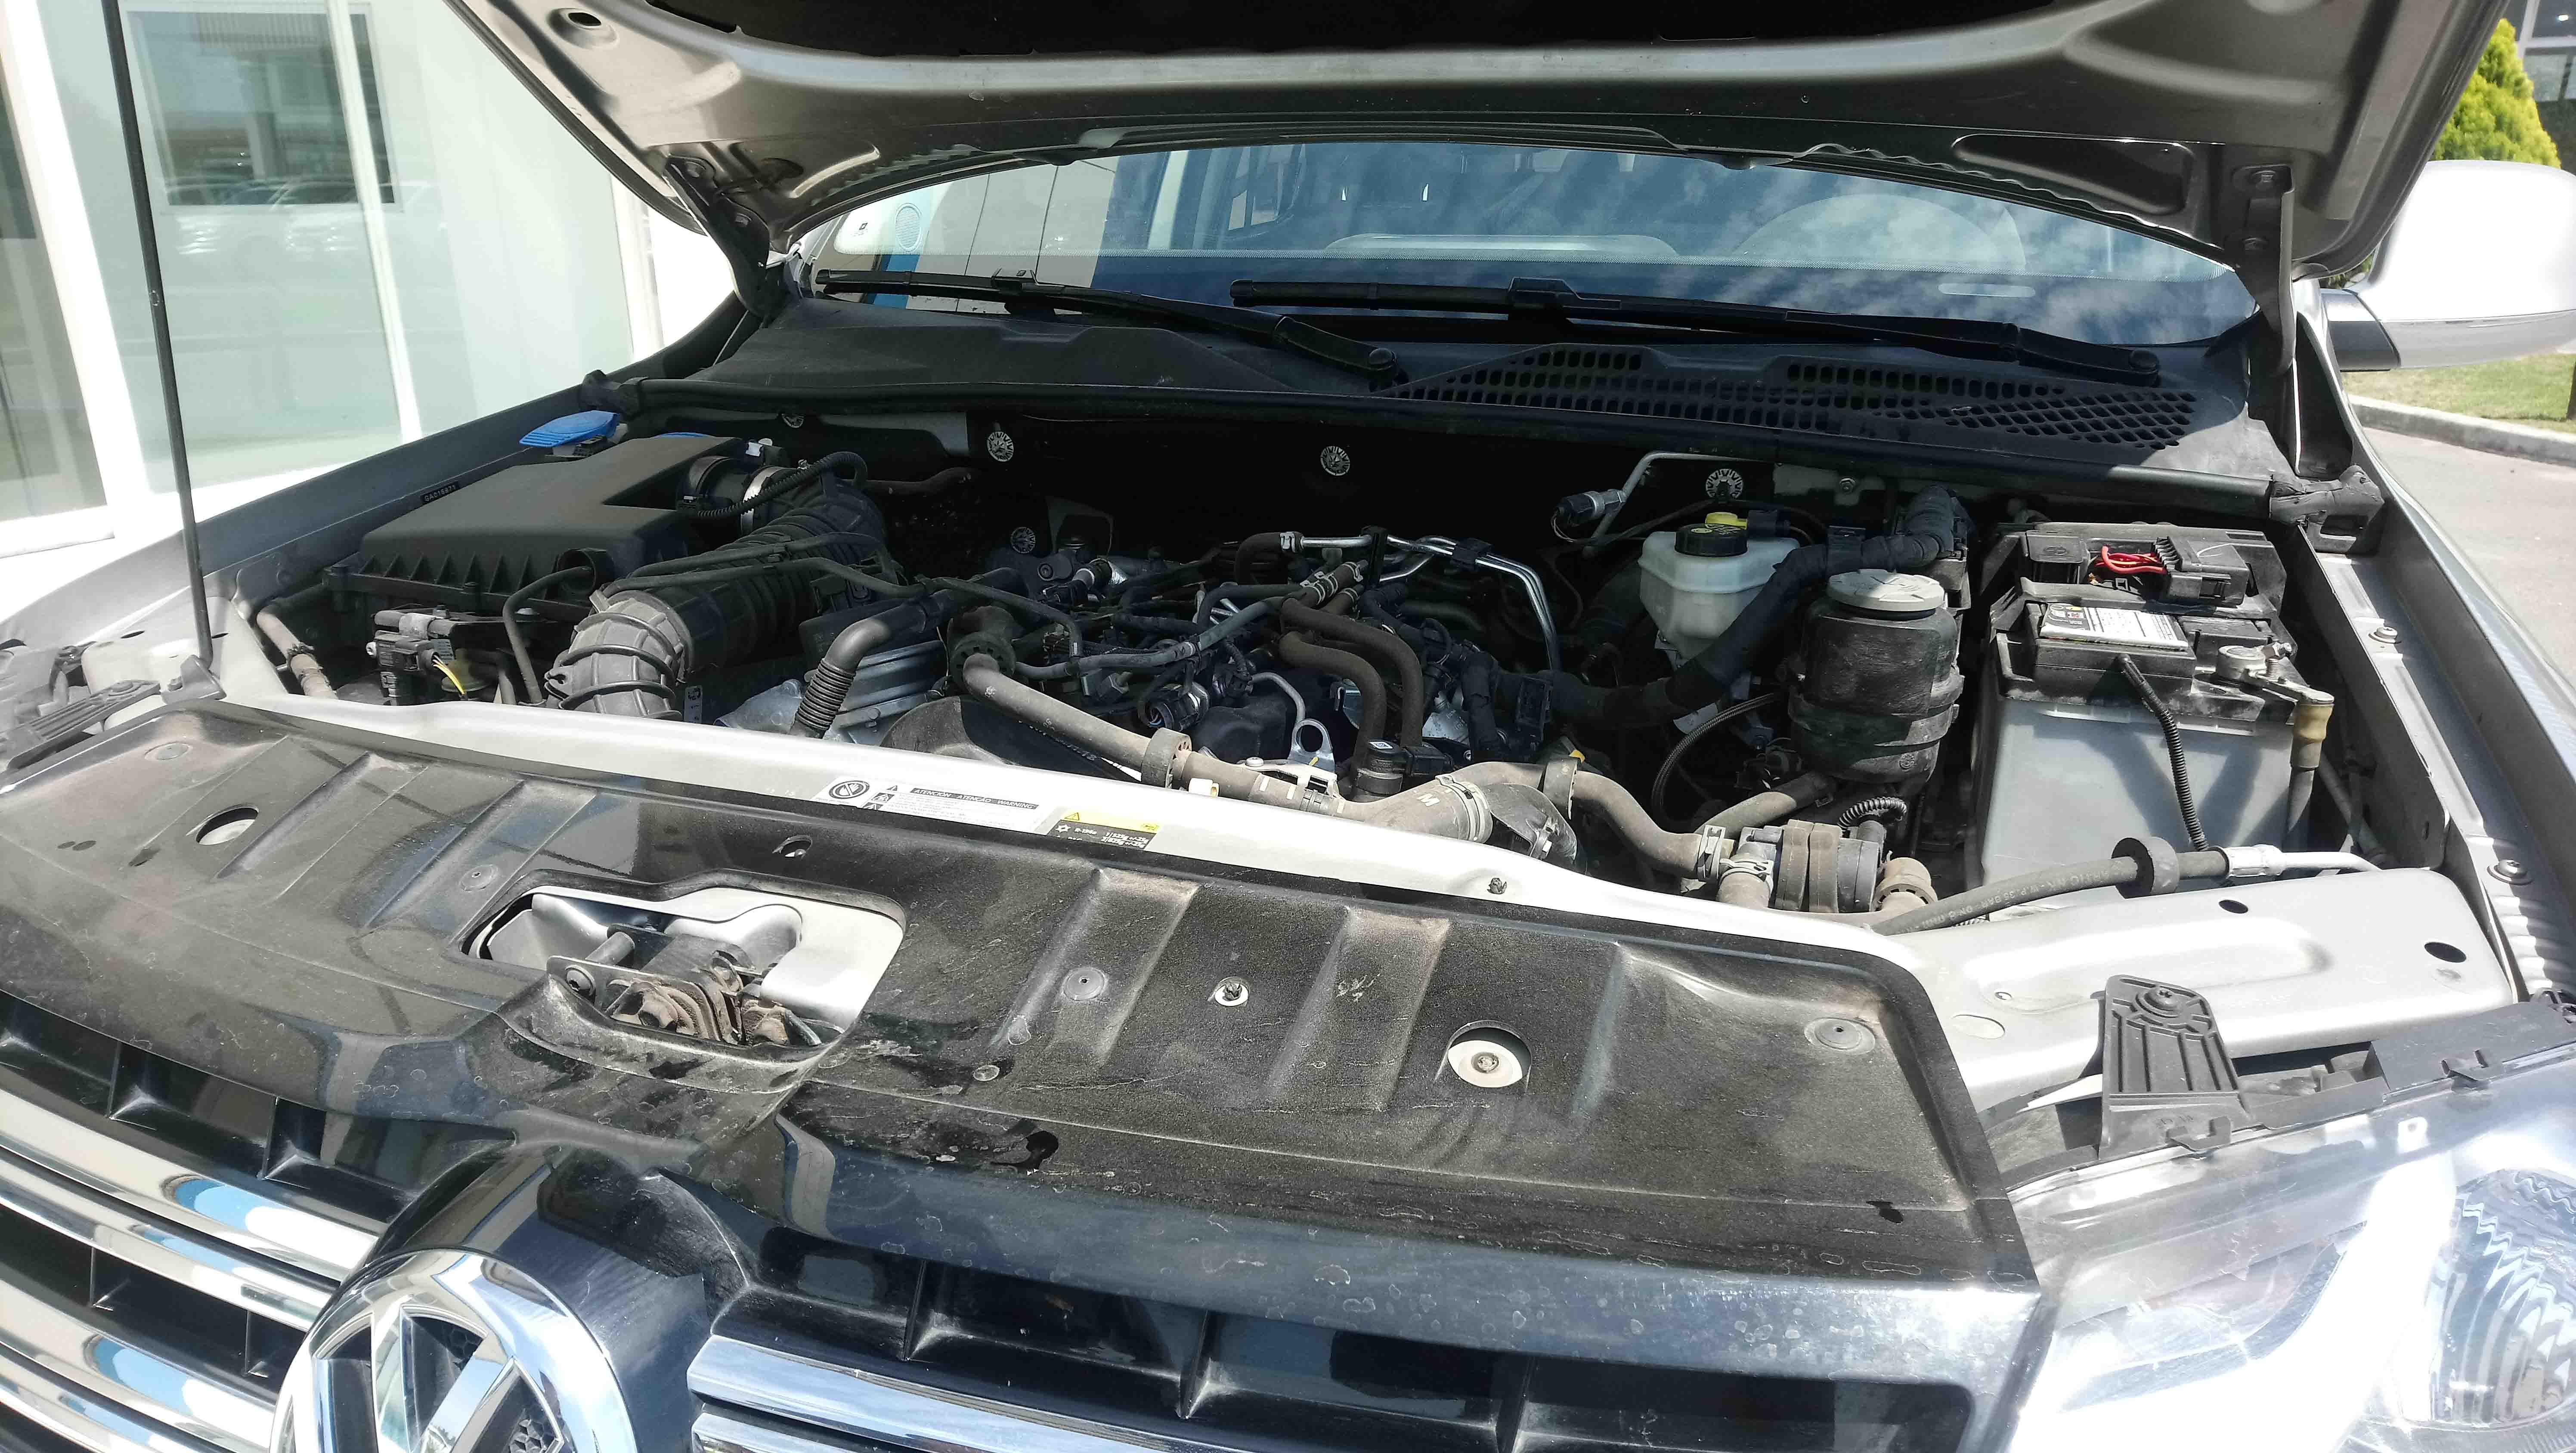 2015 Volkswagen Amarok 4x2 Higline 2.0L